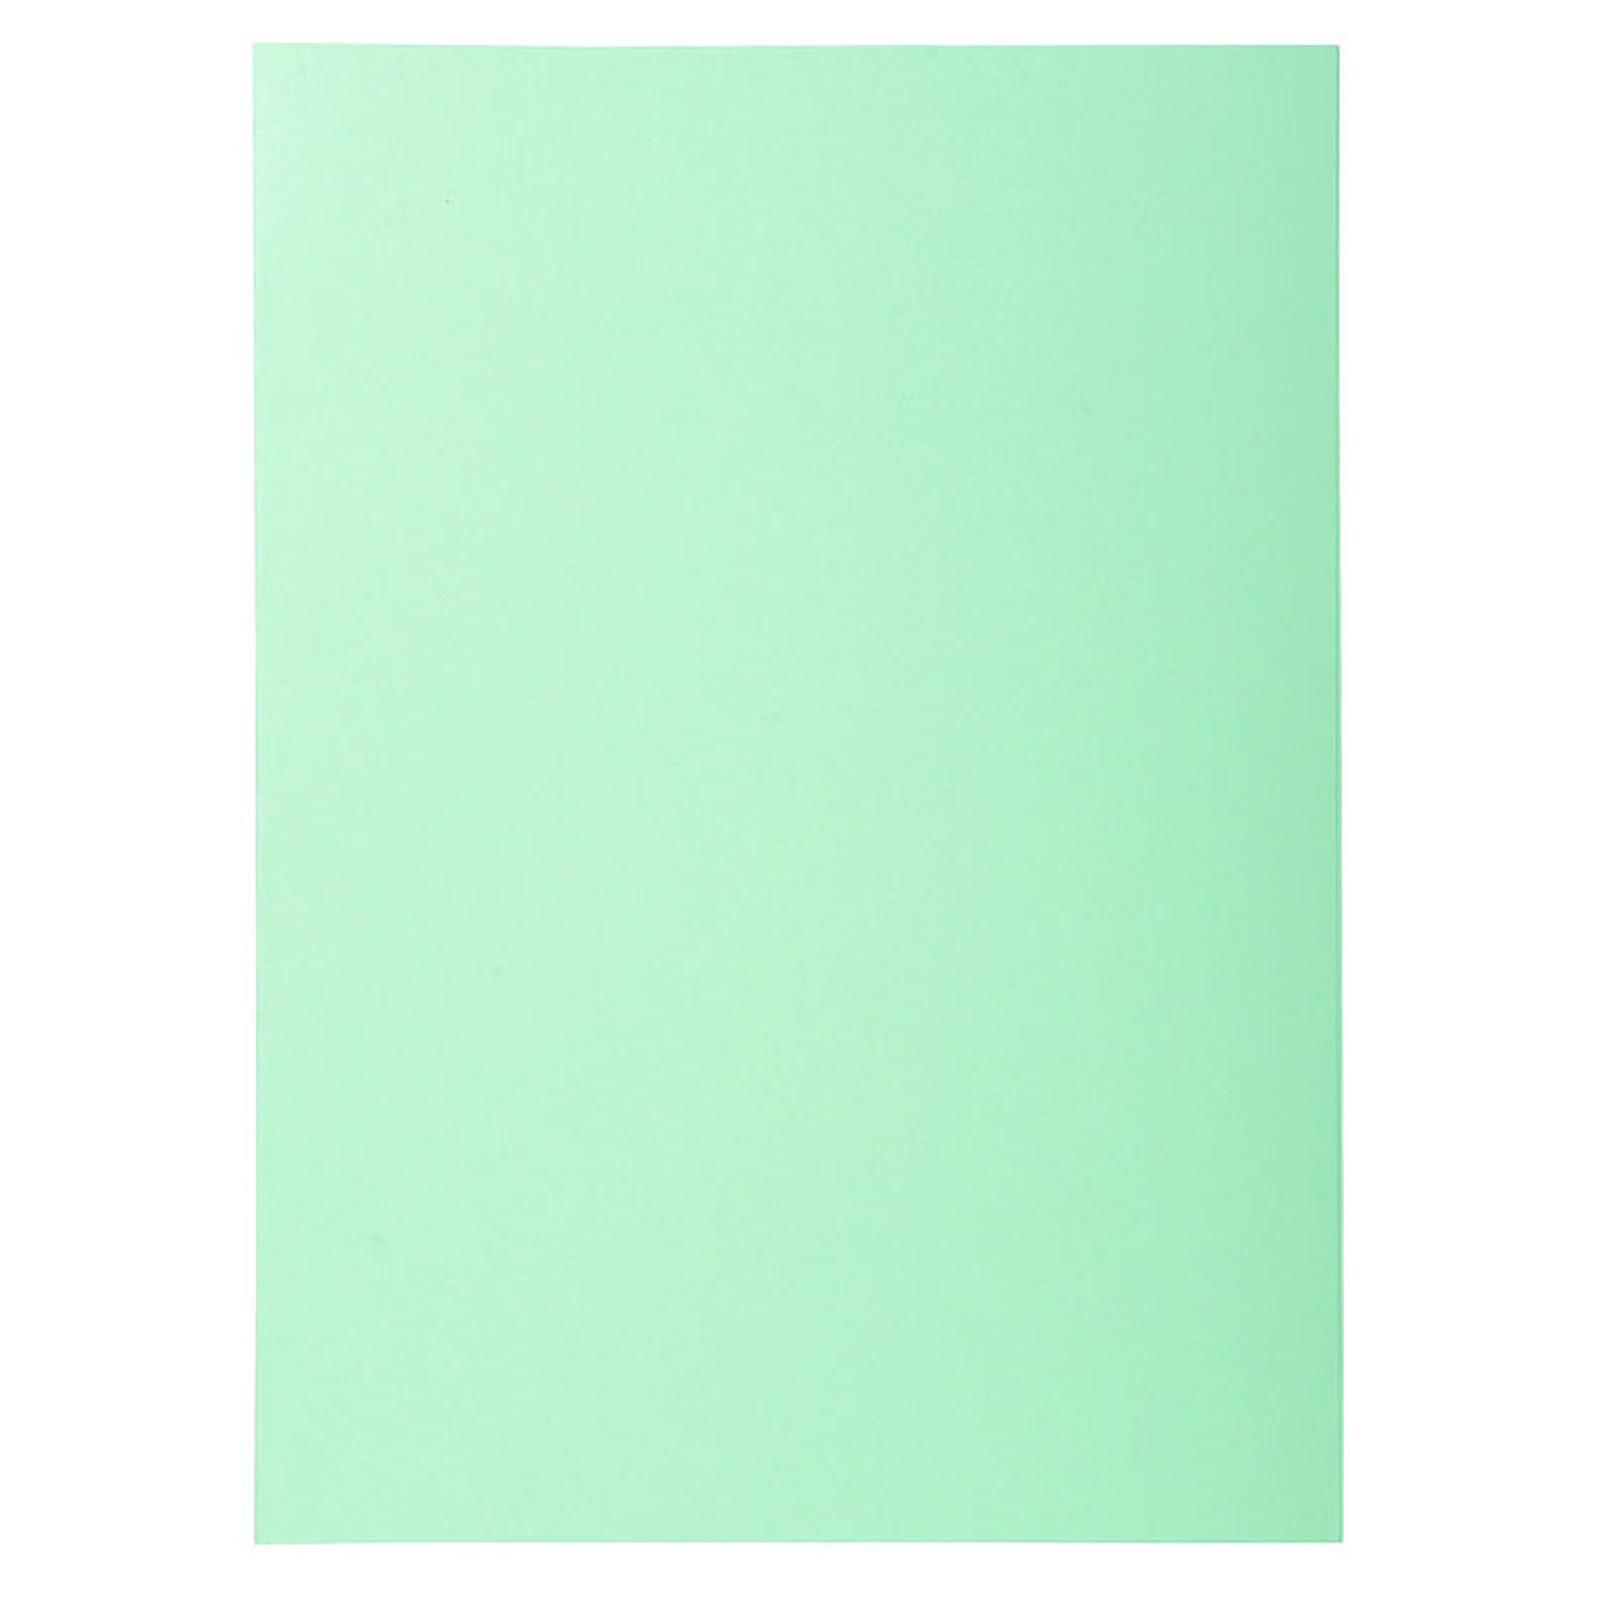 Exacompta Sous chemises Super 60 Vert x 100